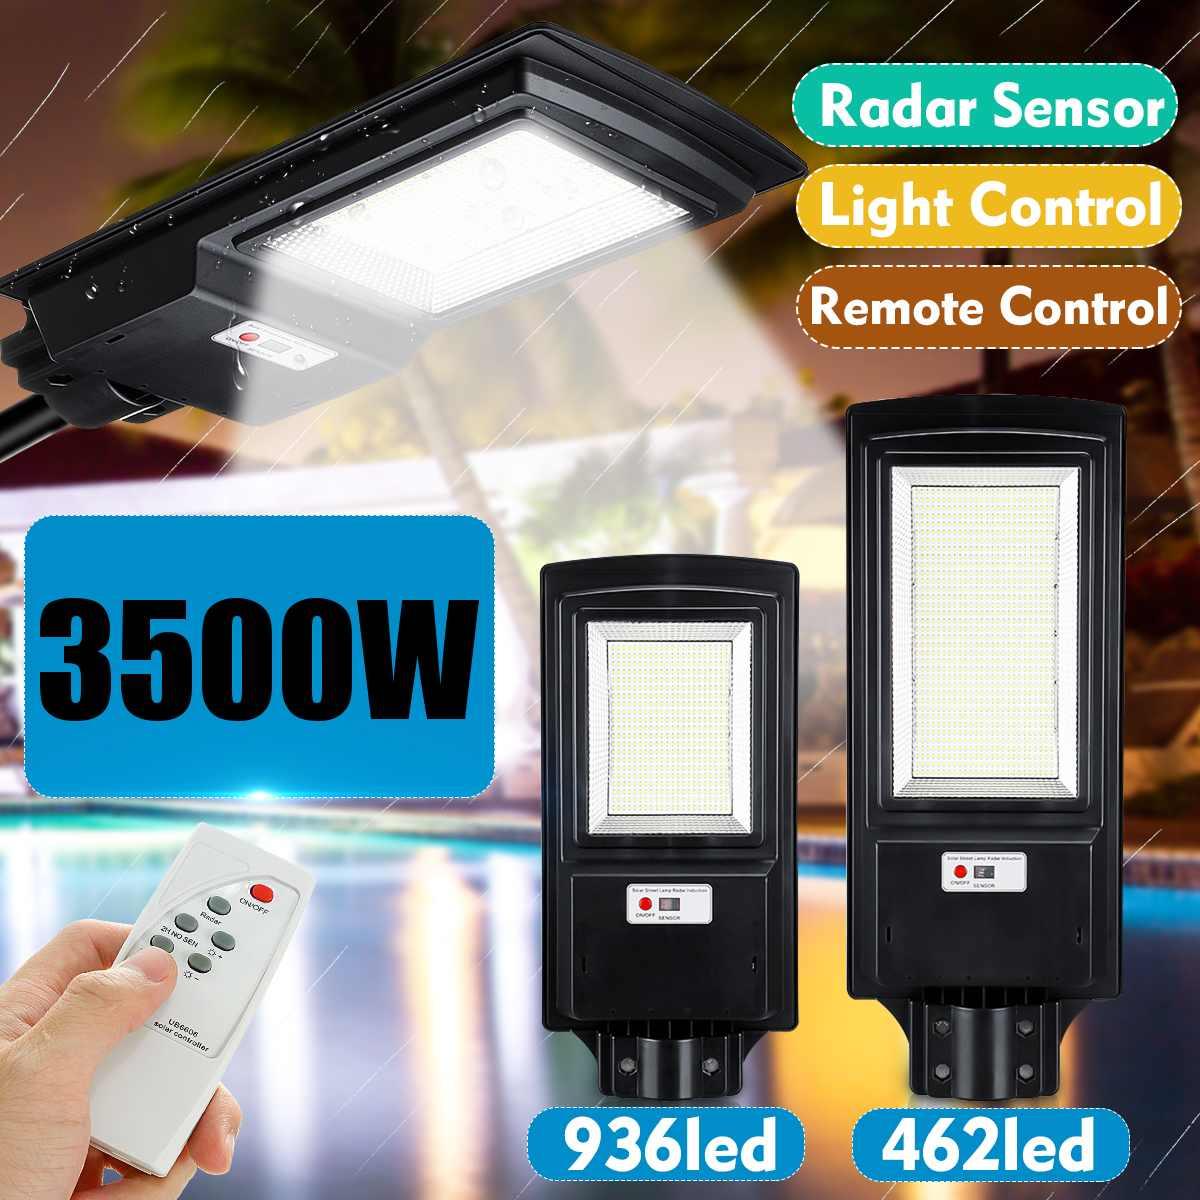 LED Solar Street Light IP65 436/936LED 8500K Light Radar Motion Sensor Wall Timing Lamp Remote Control For Garden Outdoor 3500W